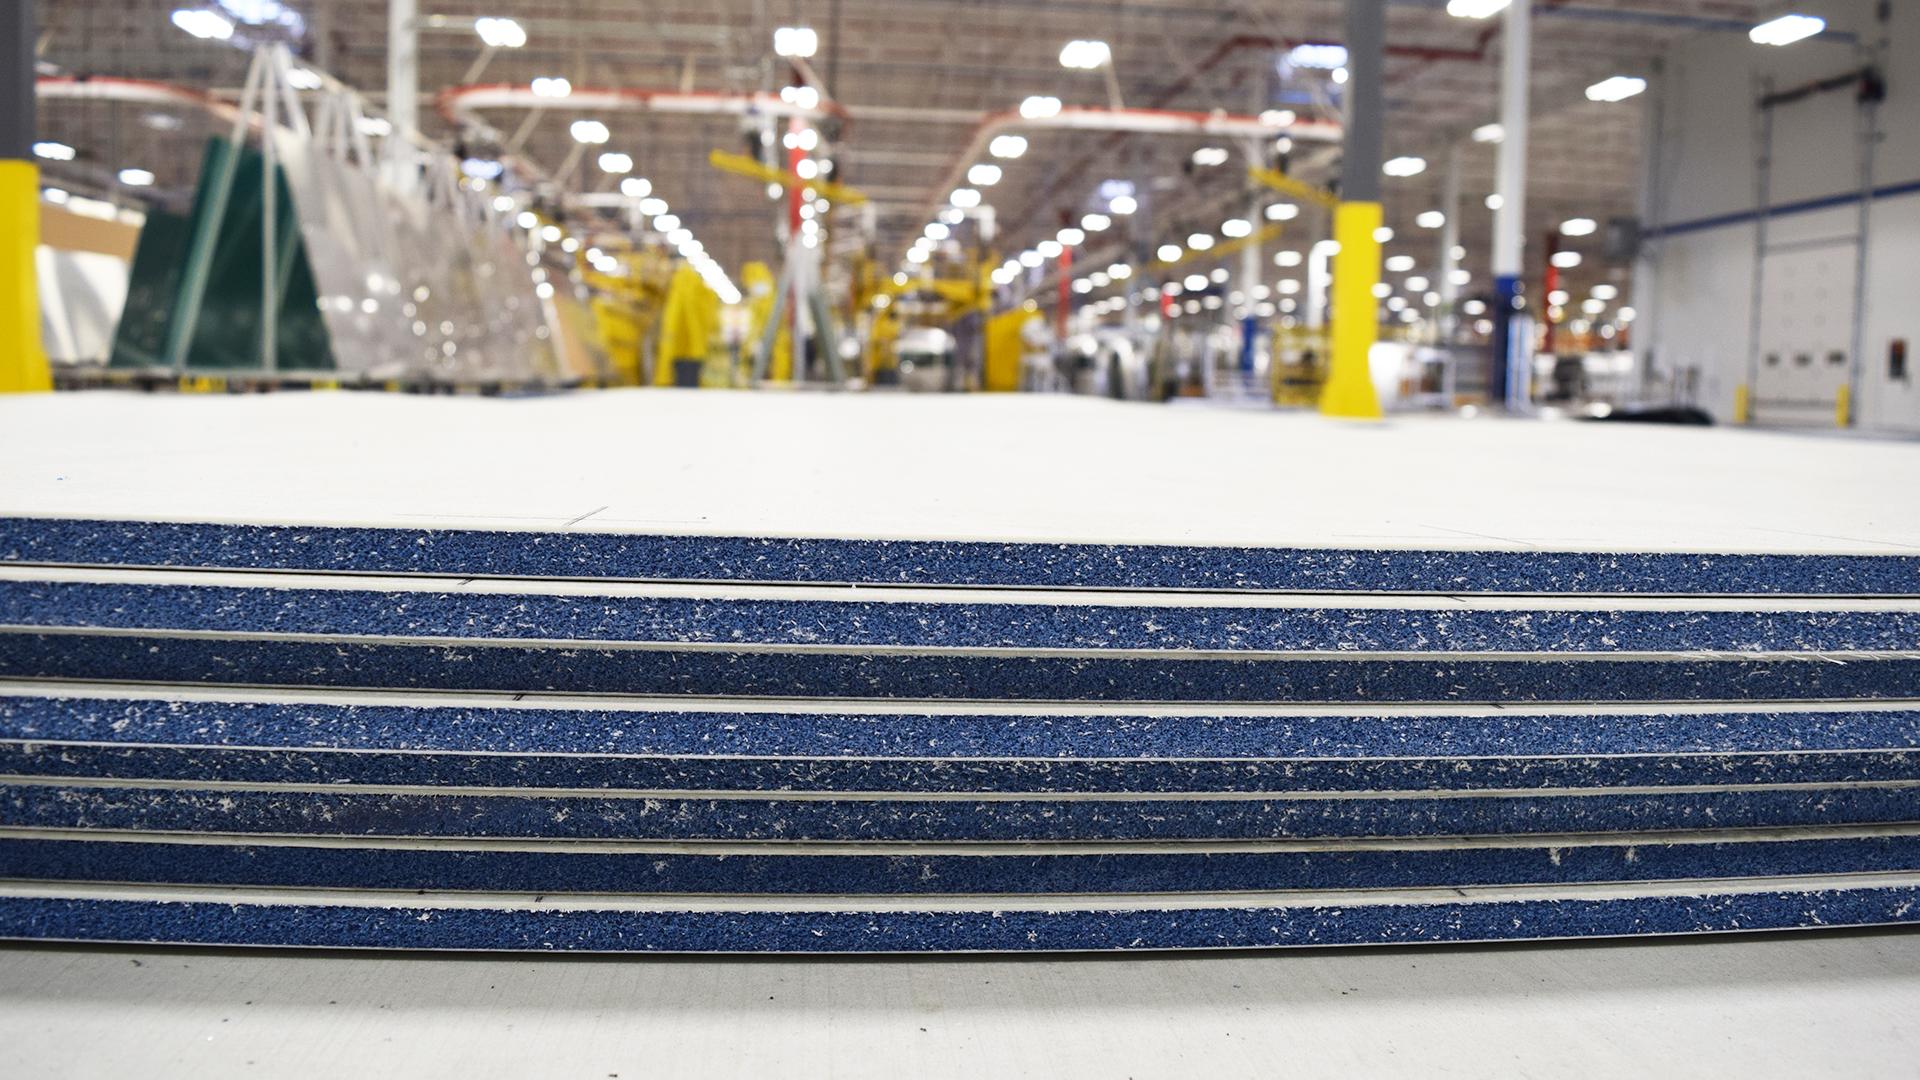 Airstream-Composite-flooring-materials-in-production-space